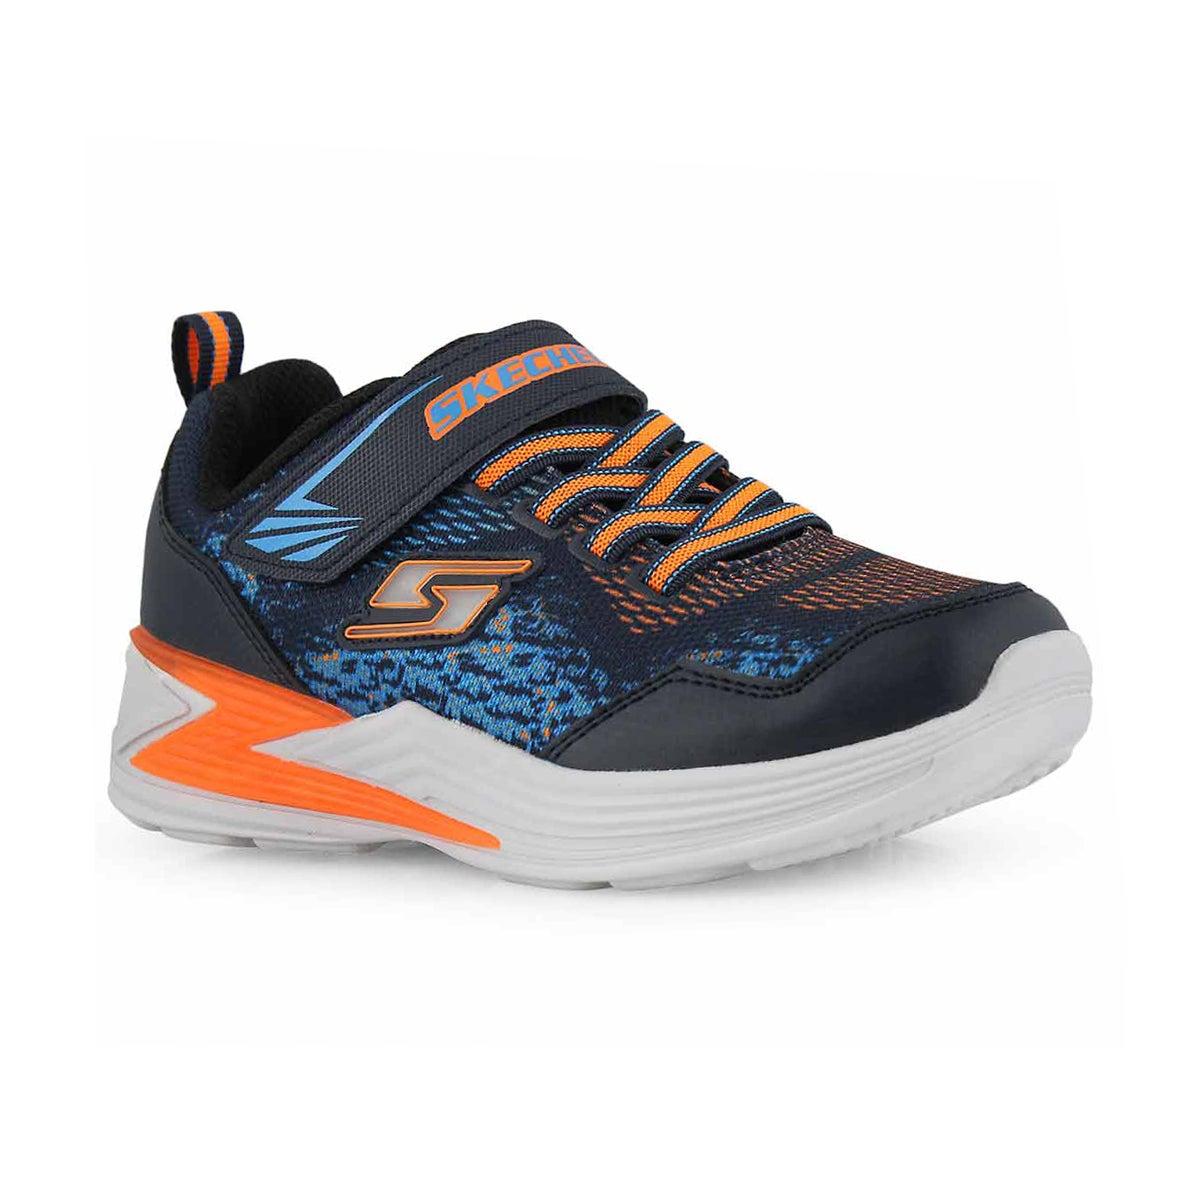 Bys Erupters III navy/orng sneaker